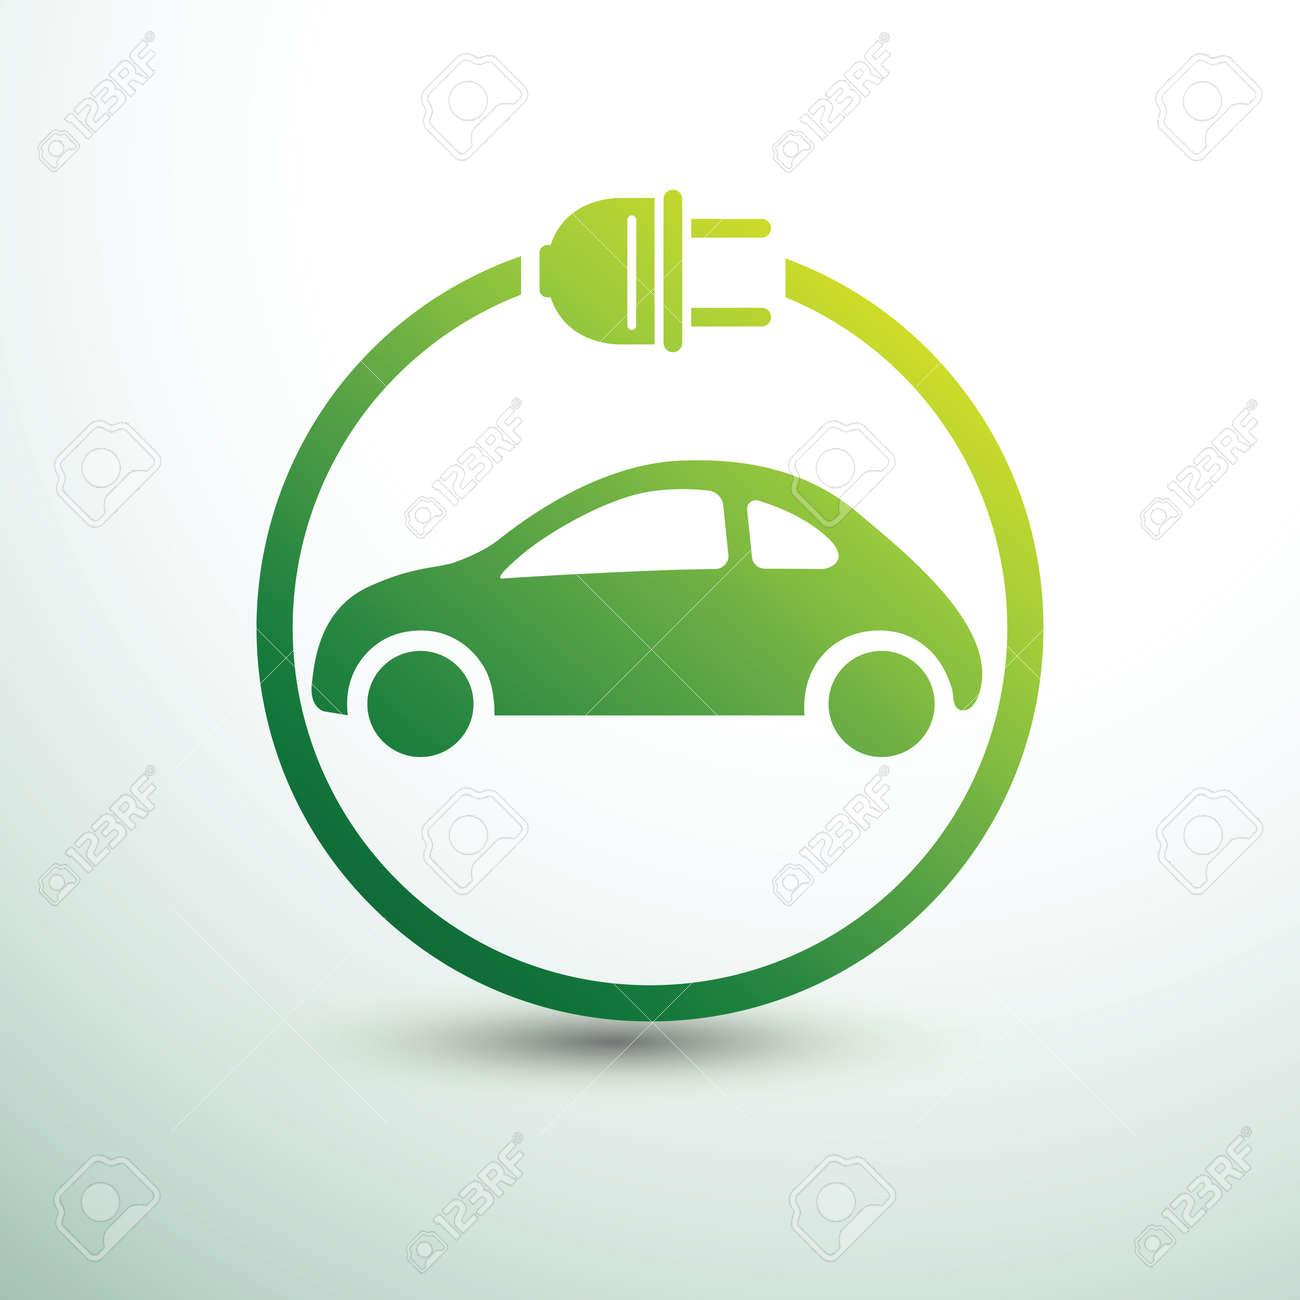 Electric car concept green drive symbol,vector illustration - 80871401